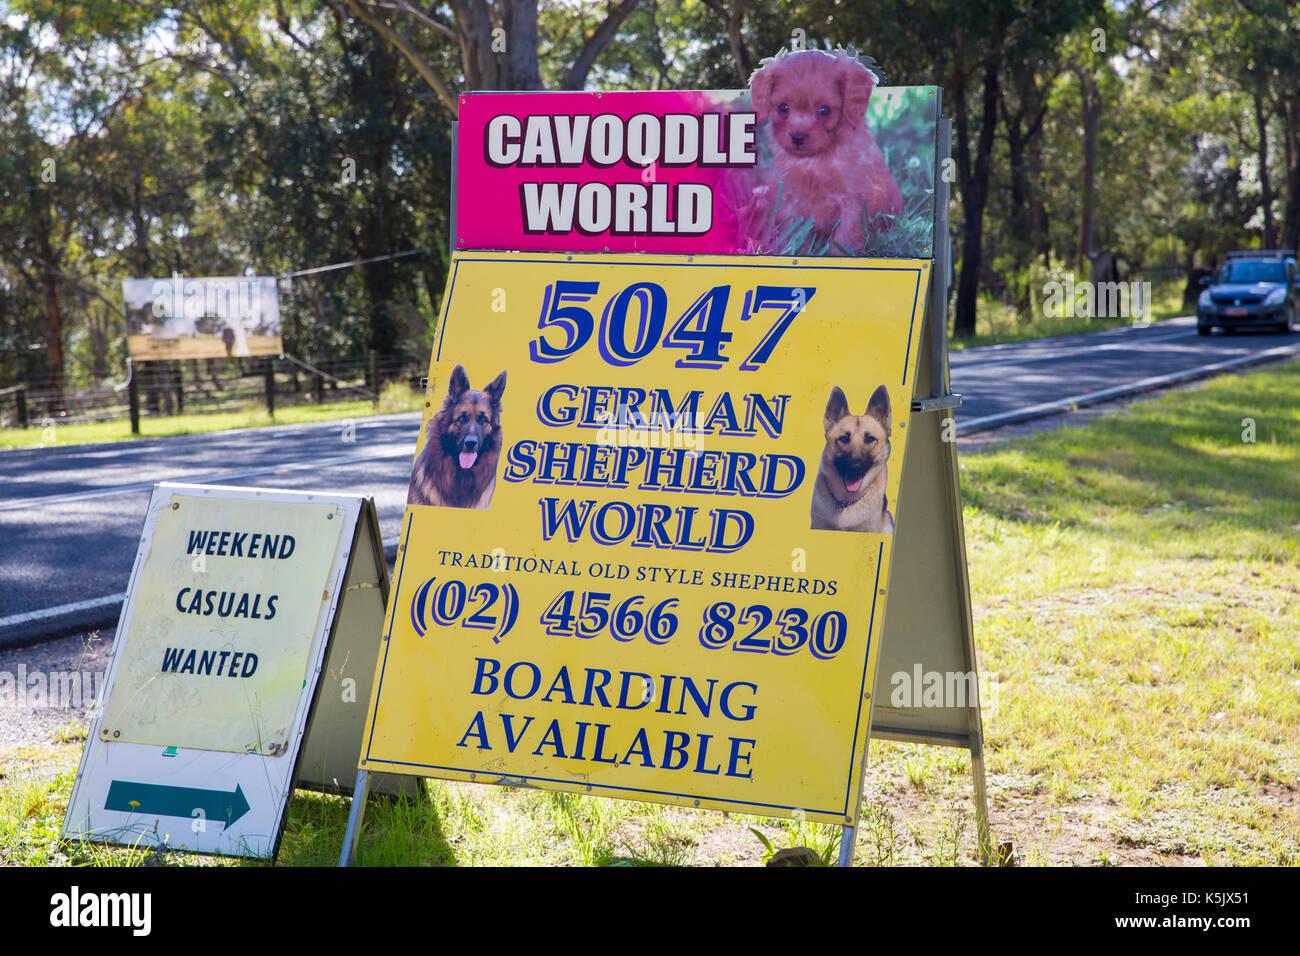 Australian dog breeder selling cavoodles and german shepherd alsatian dogs,Australia - Stock Image